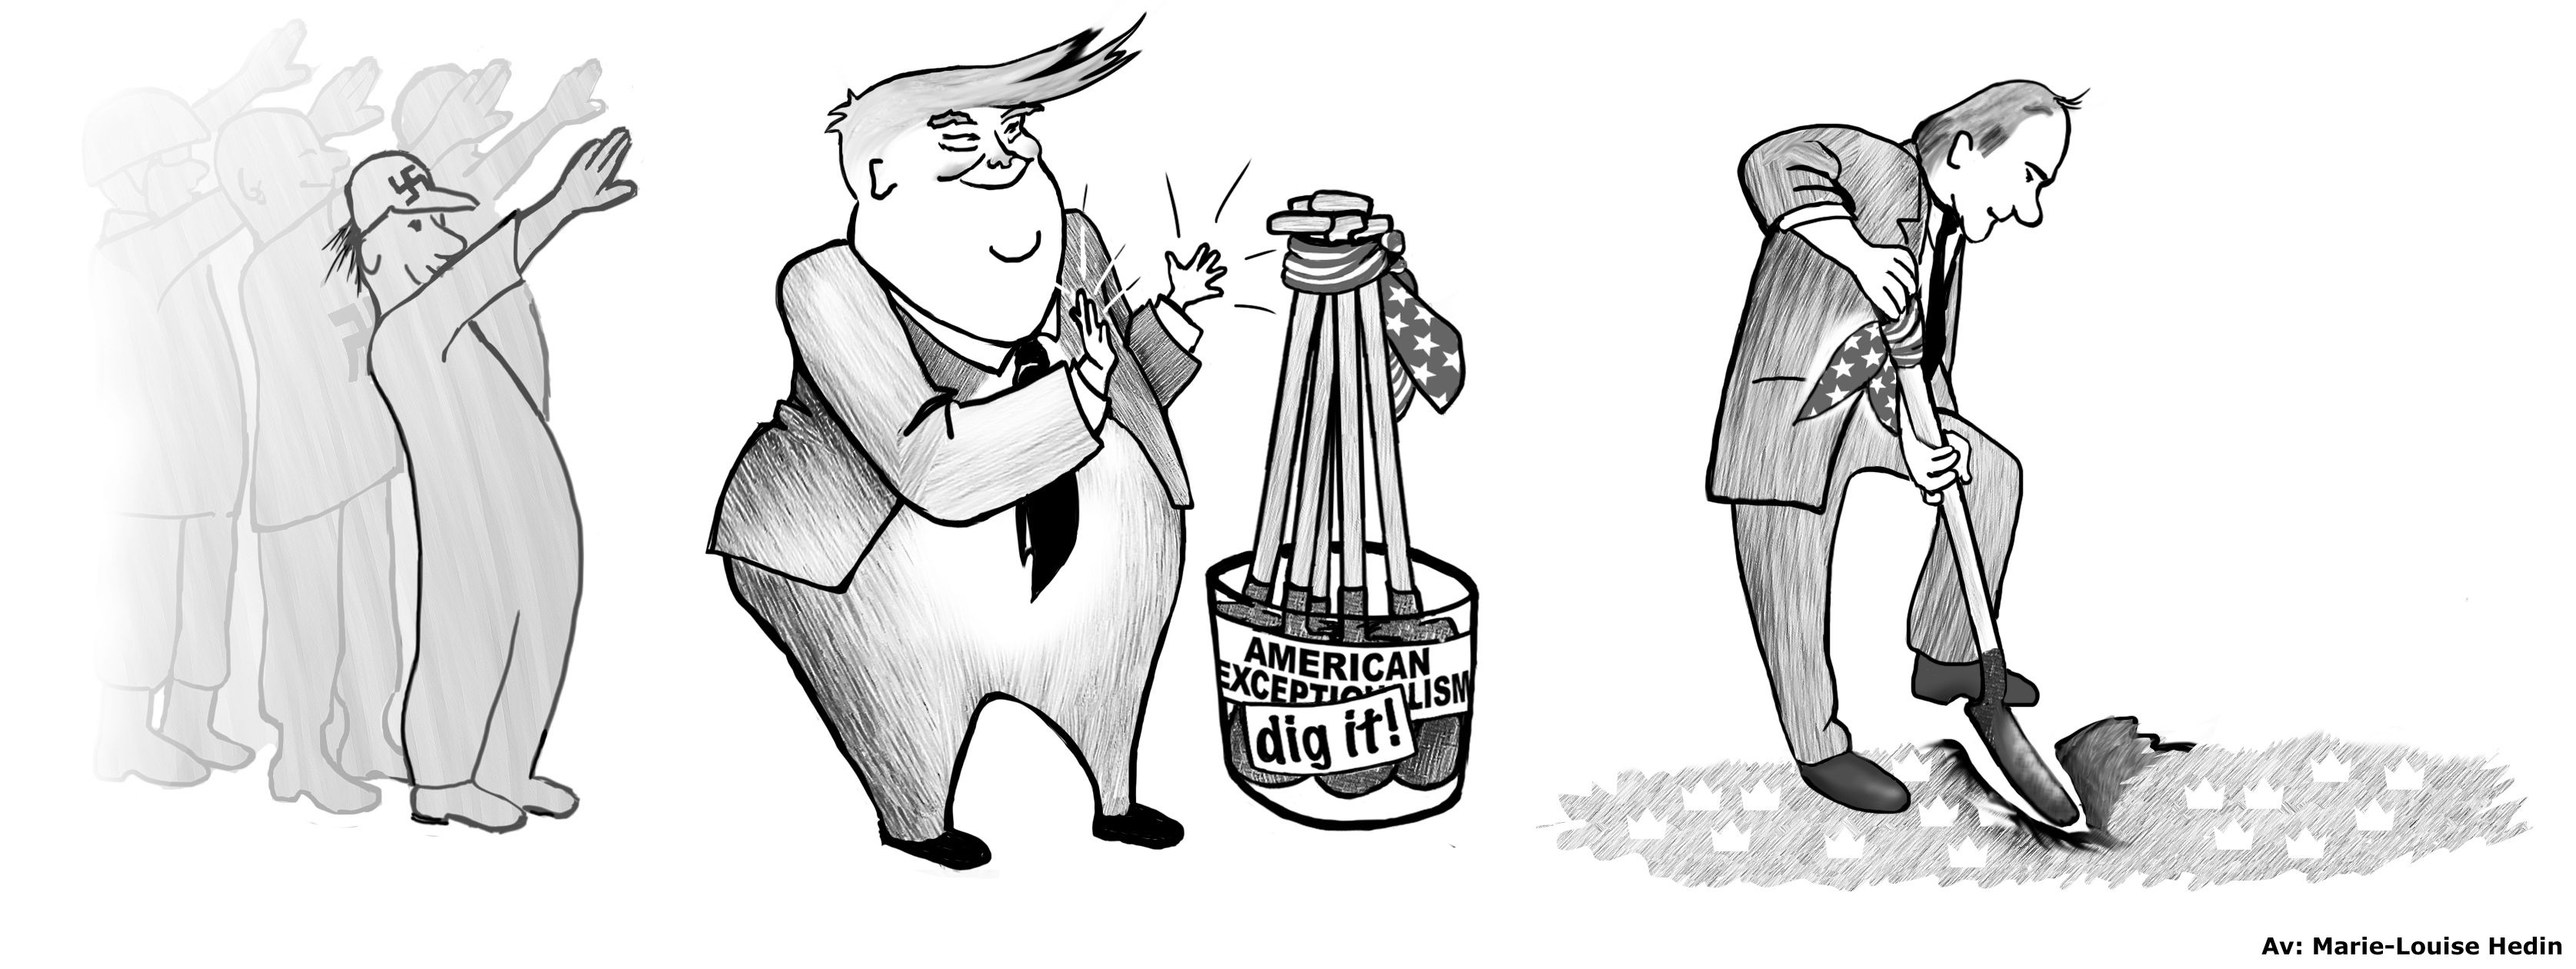 political cartoon mocking Swedish prime minister